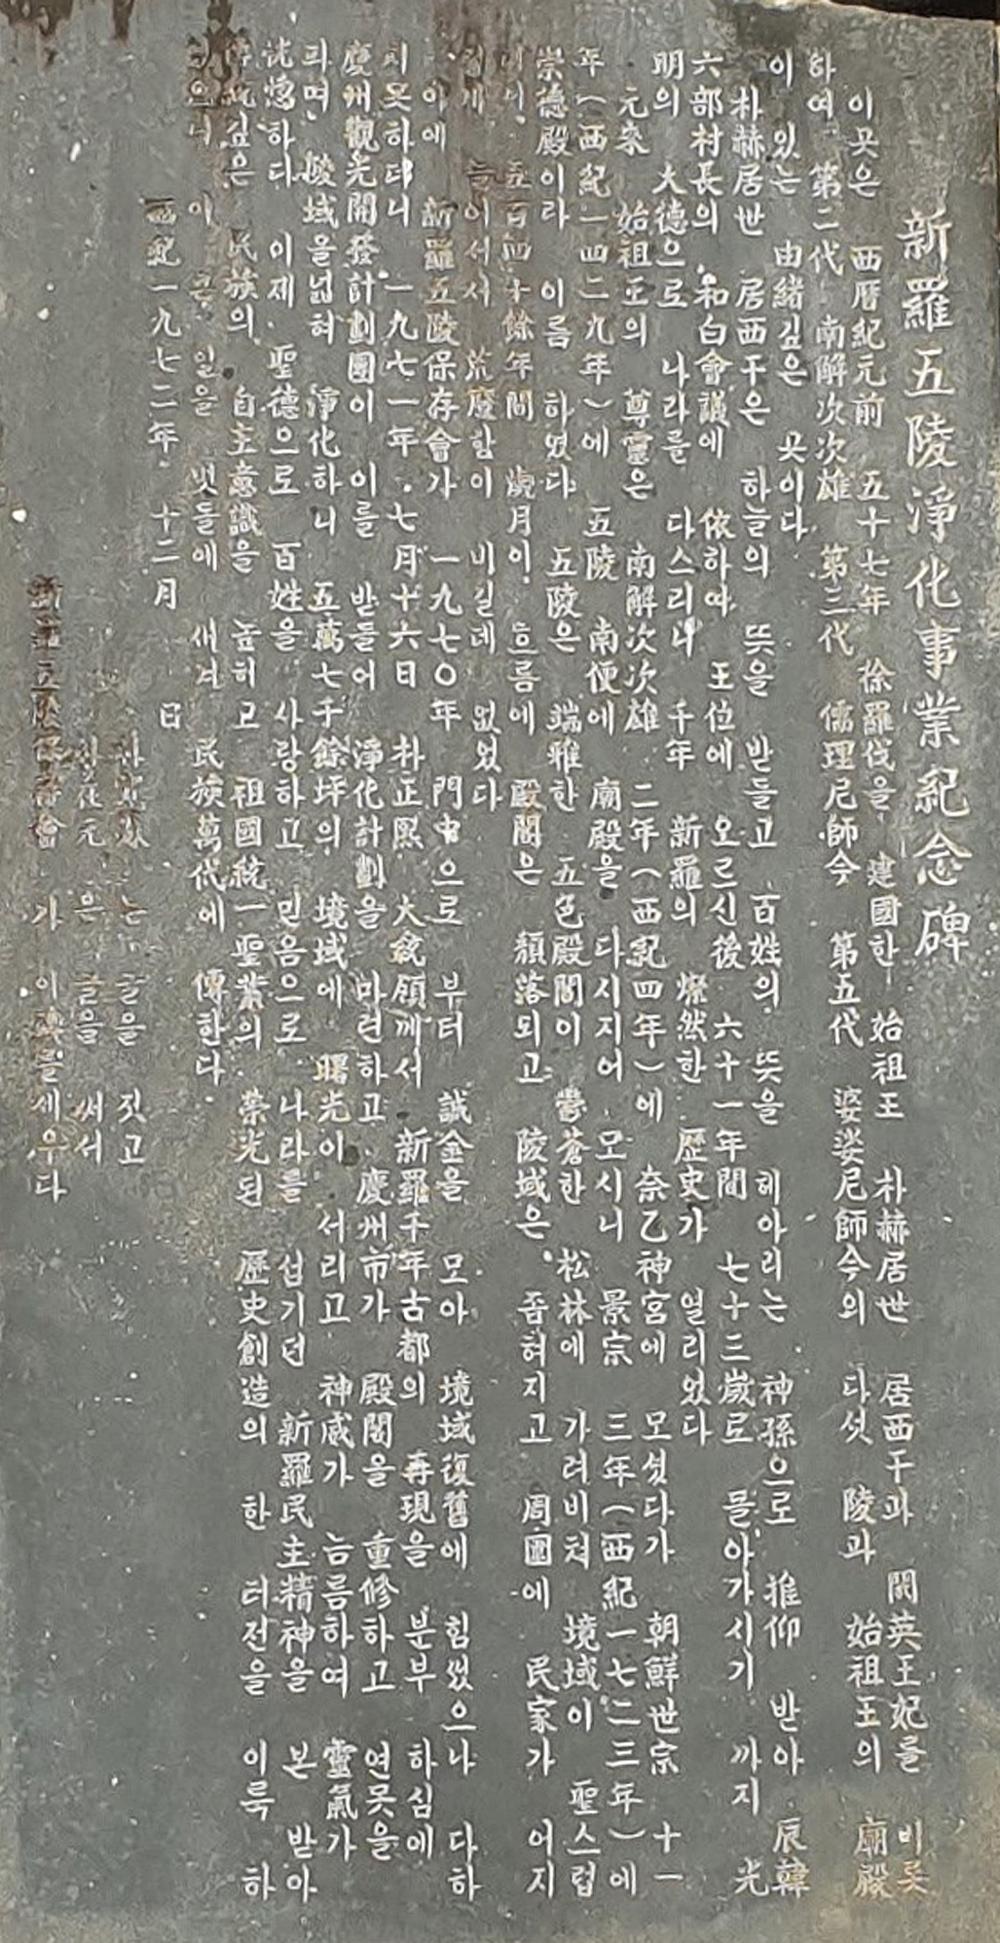 20190124_130613